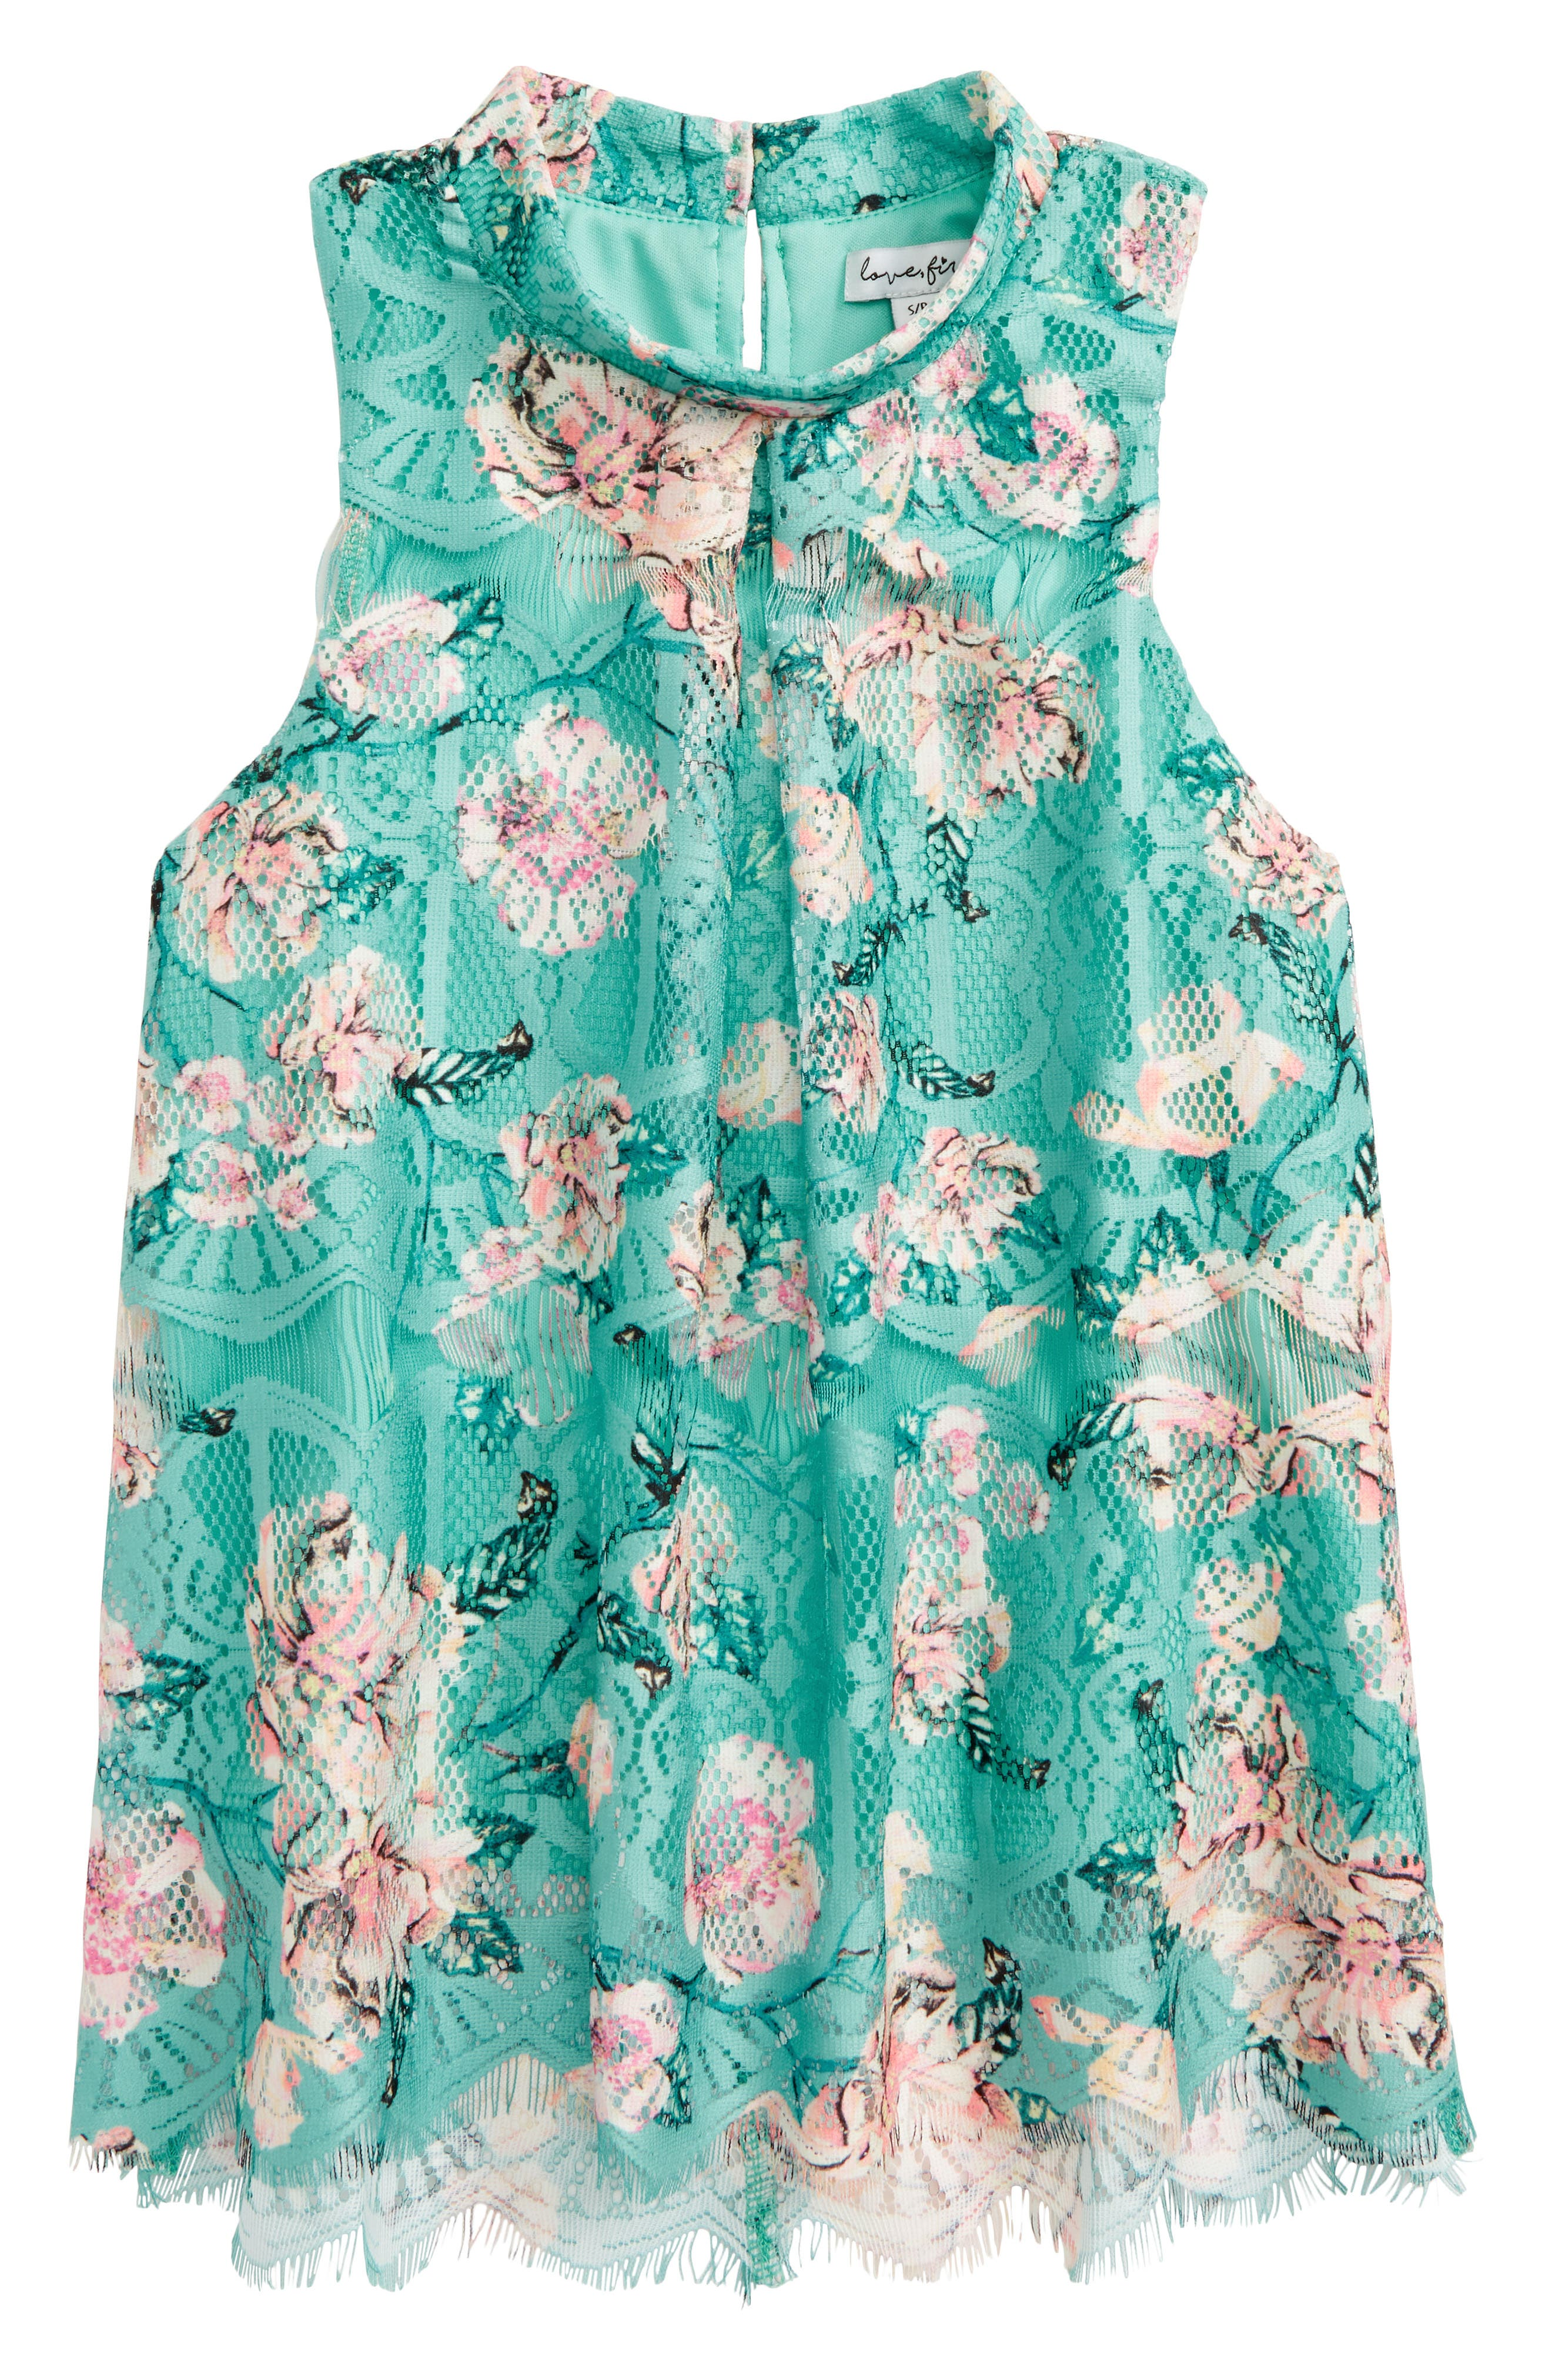 Floral Lace Swing Top,                         Main,                         color, Mint